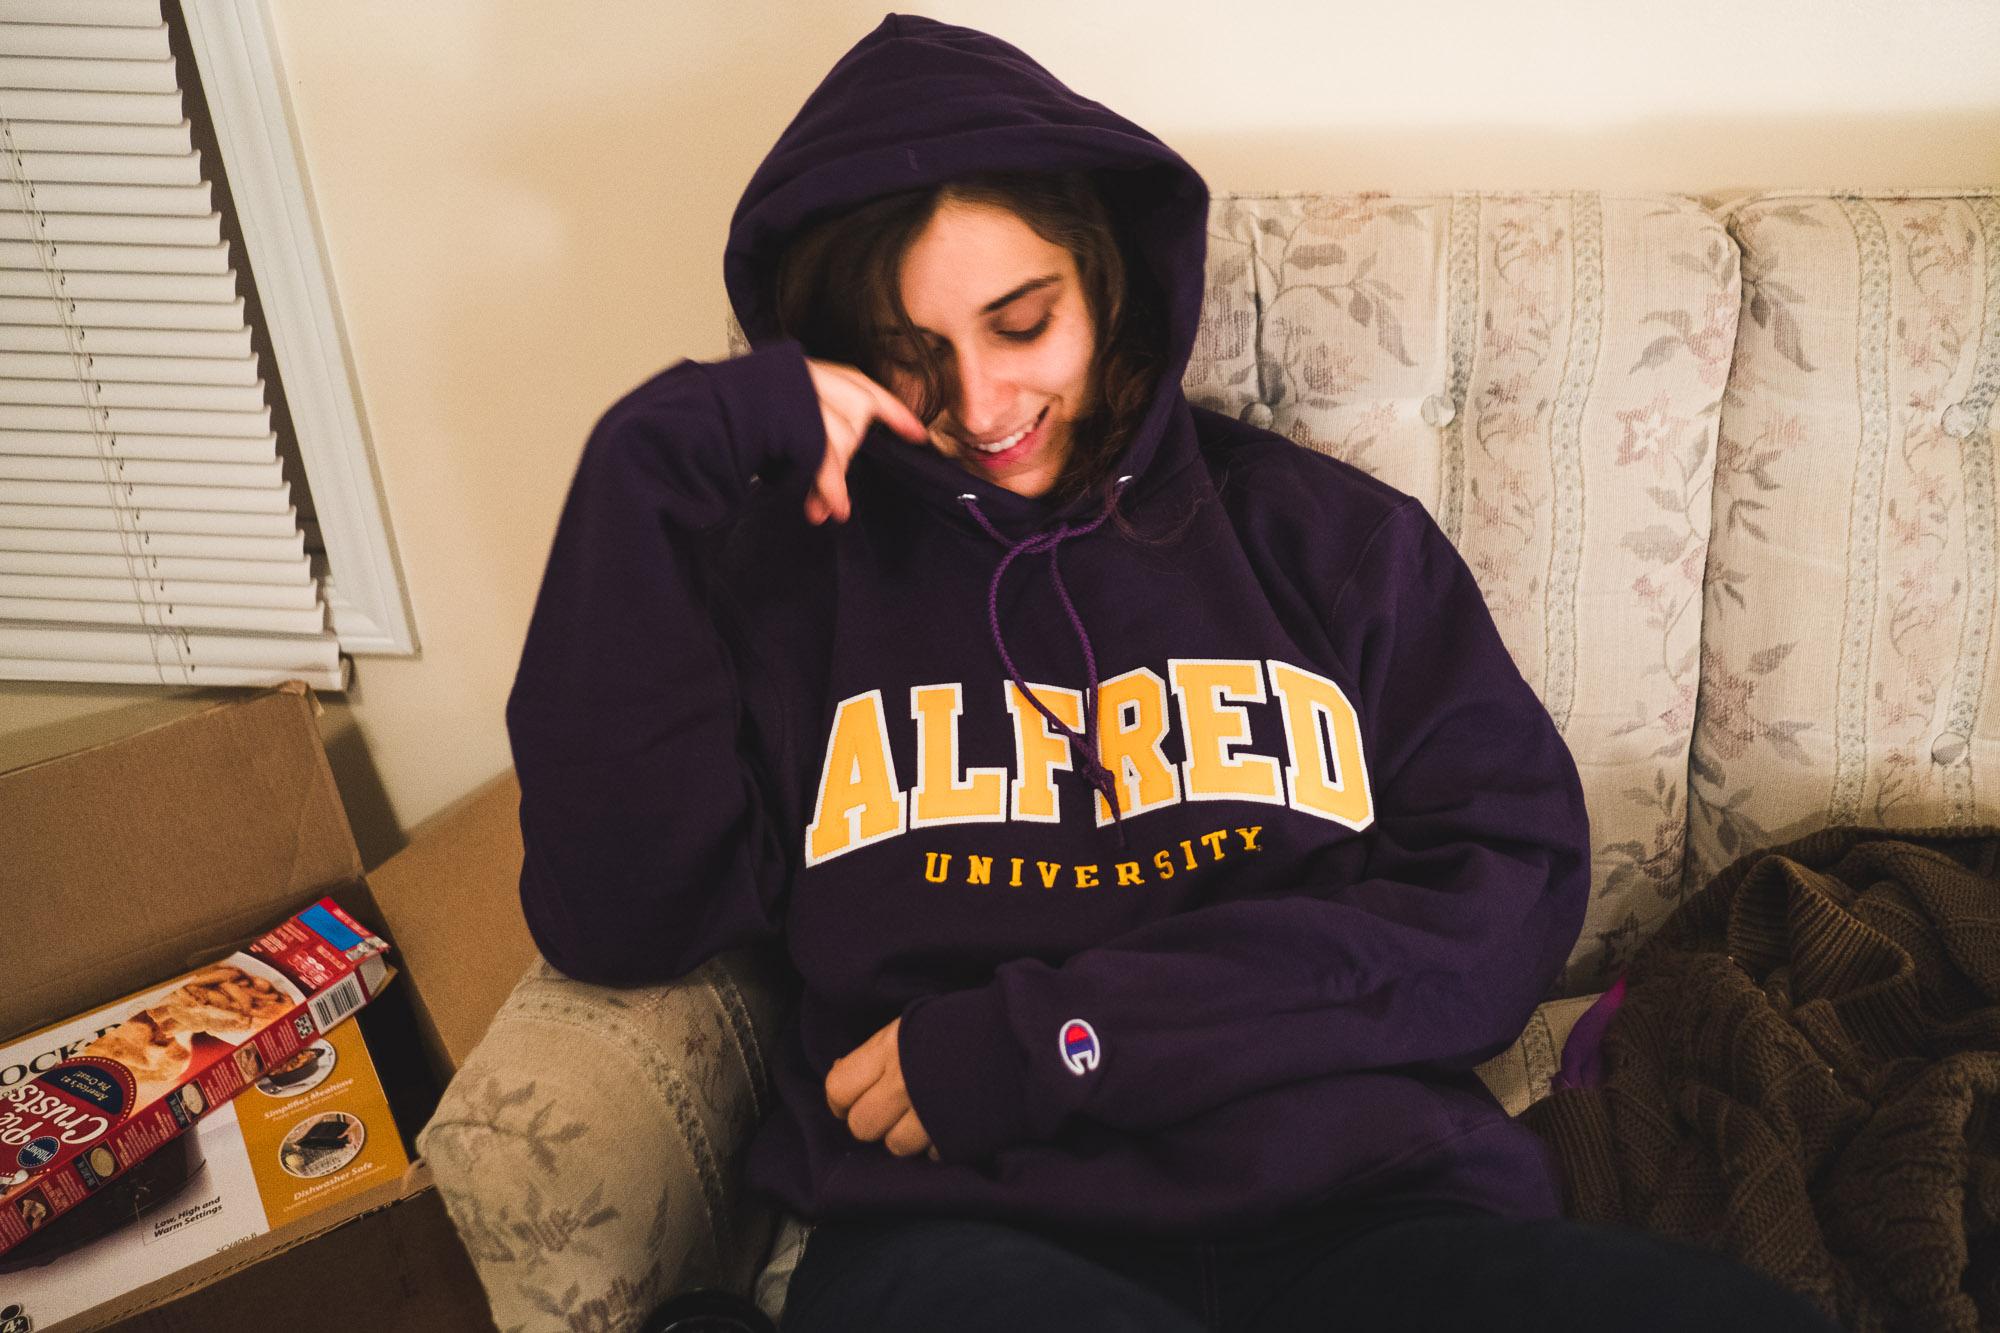 alfred-university-sweater